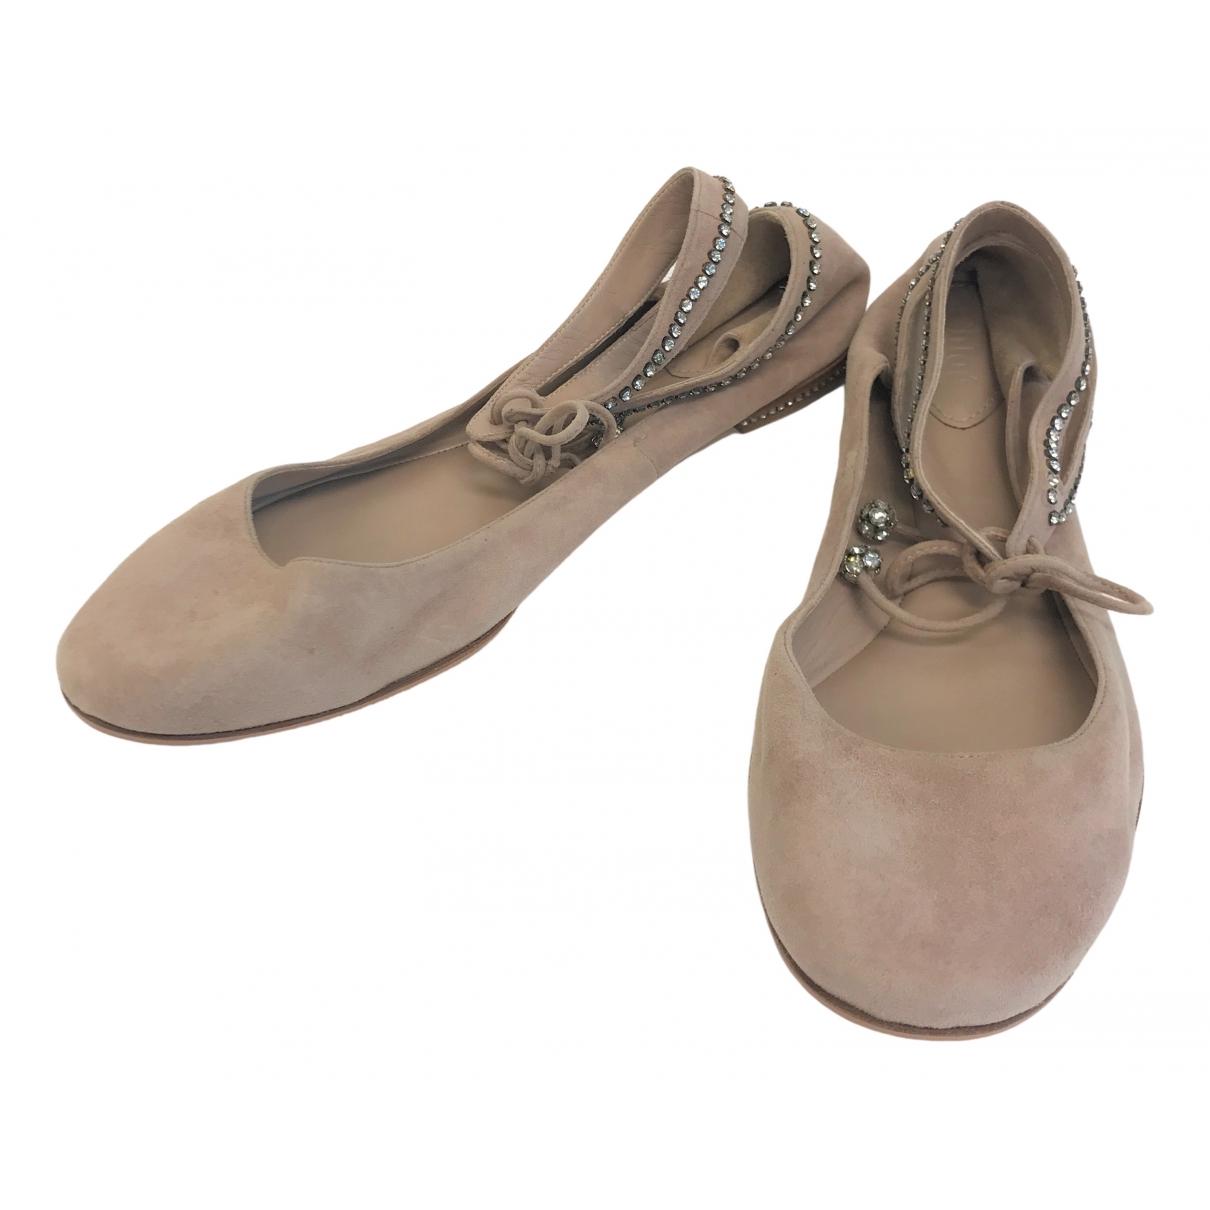 Chloé \N Pink Suede Ballet flats for Women 38.5 EU